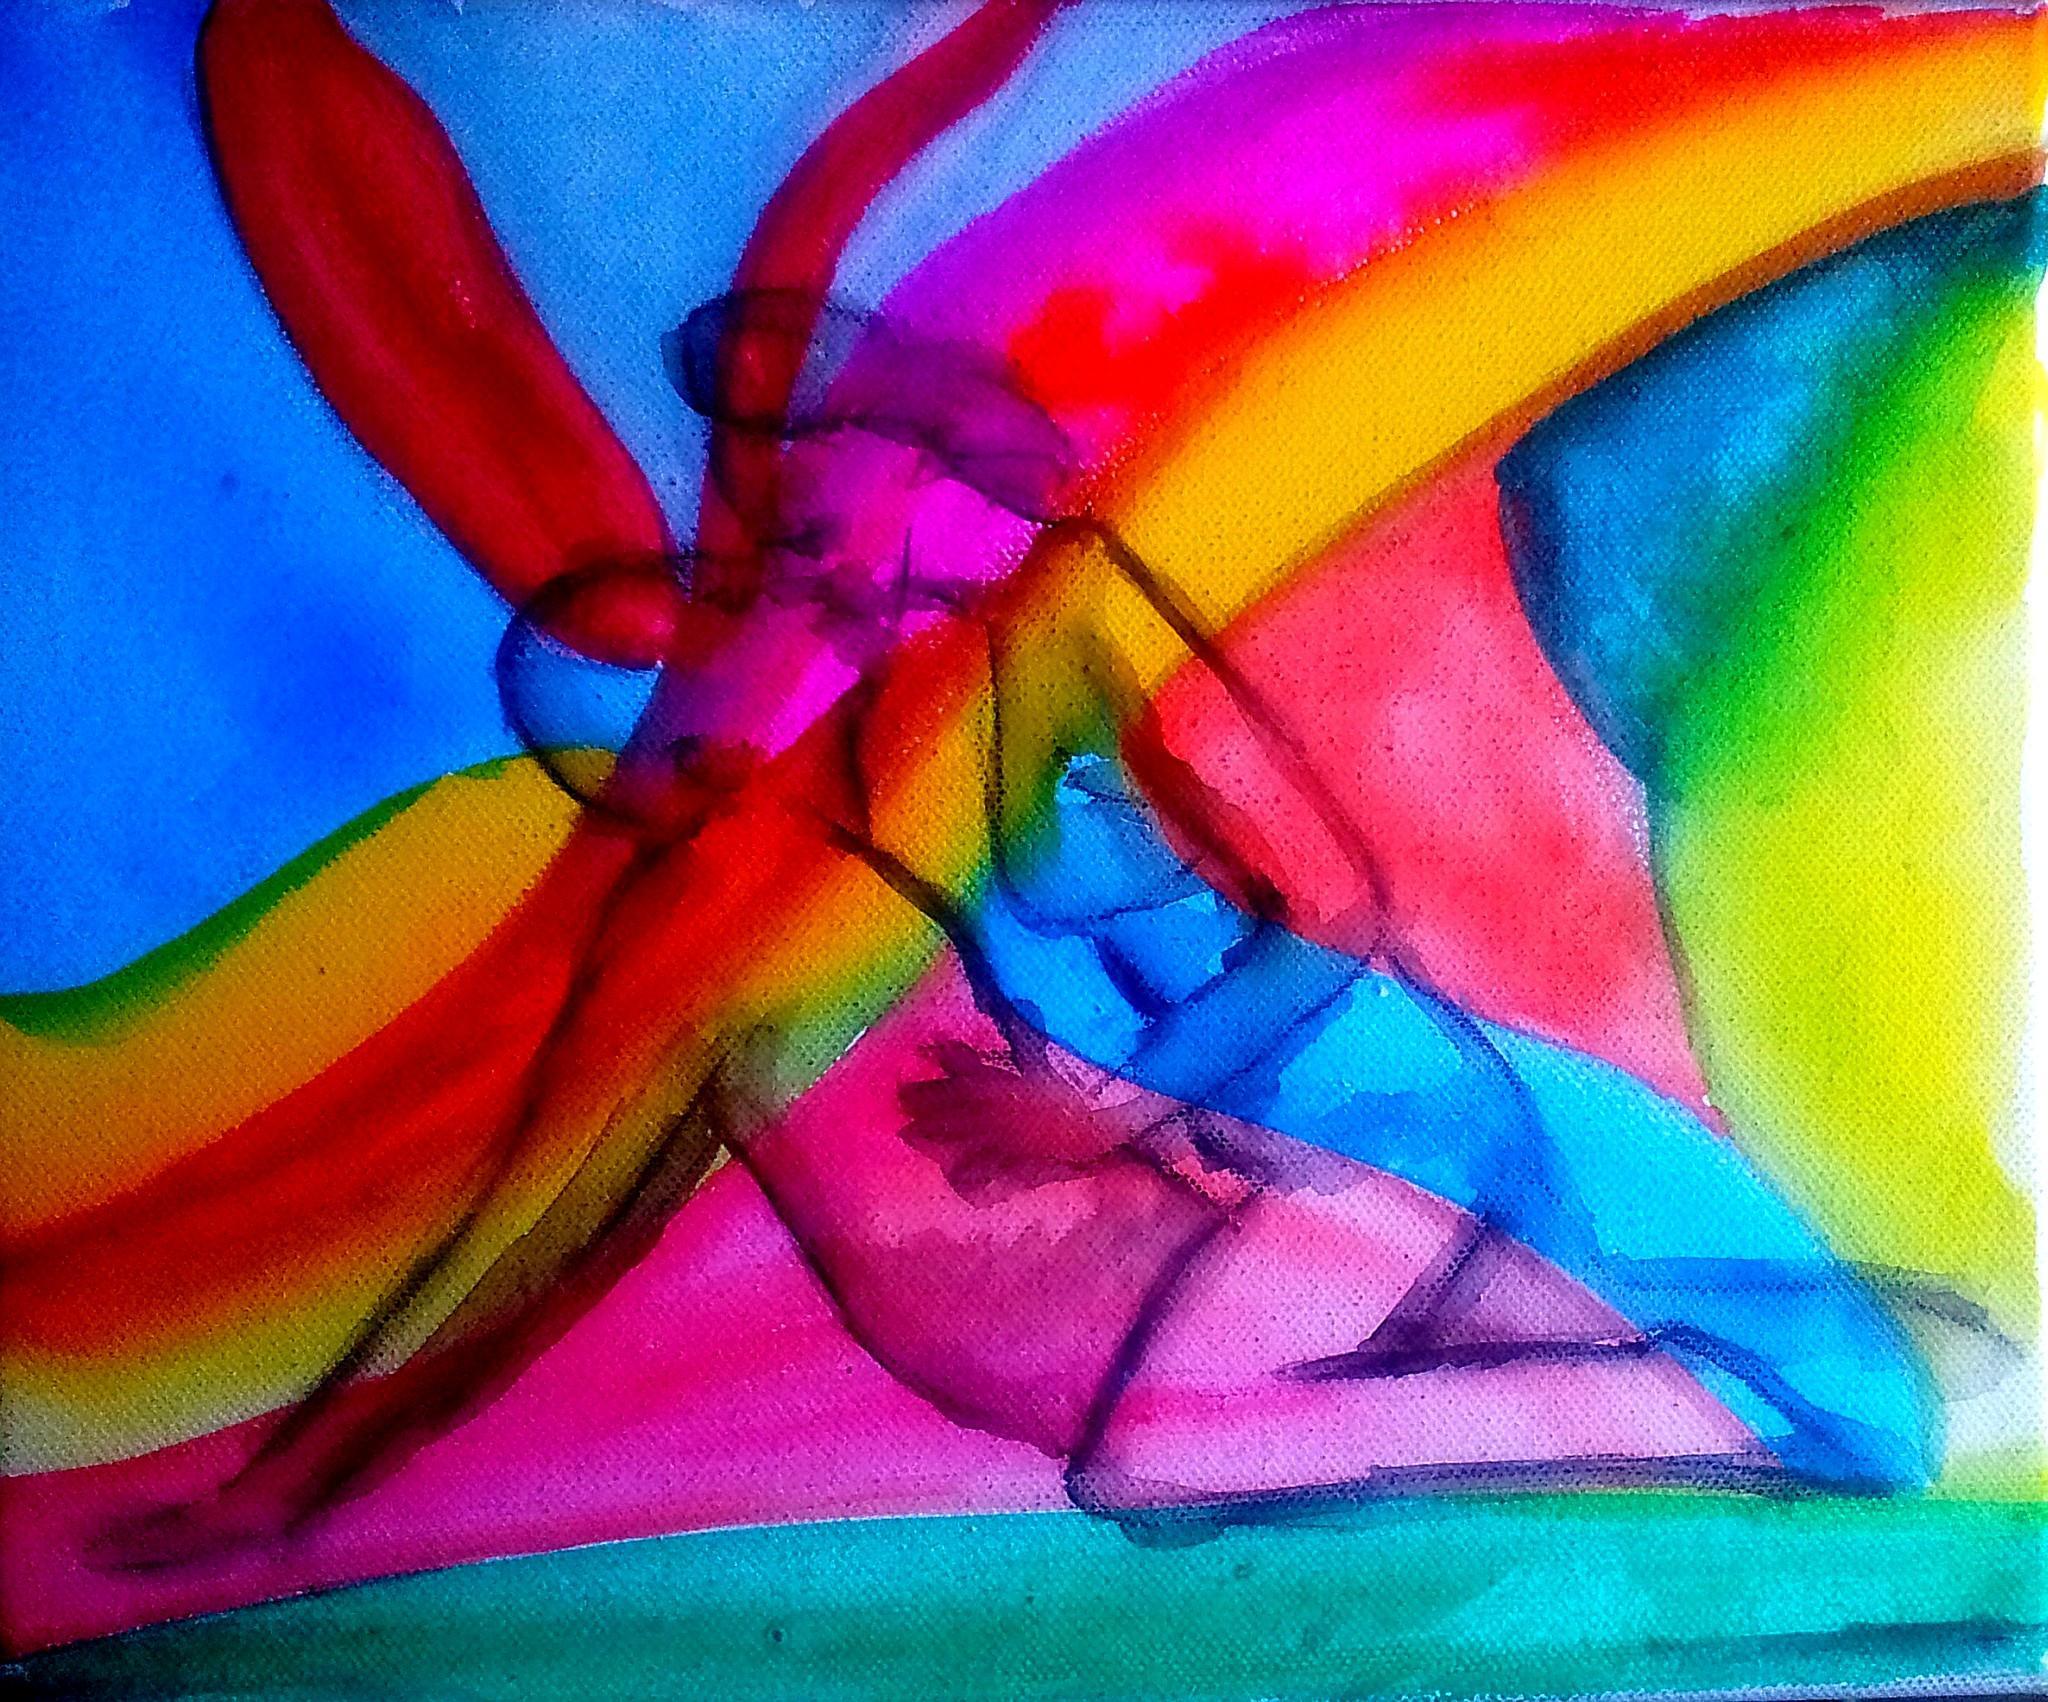 Paar beim Liebesspiel, Aquarell, Künstler unbekannt